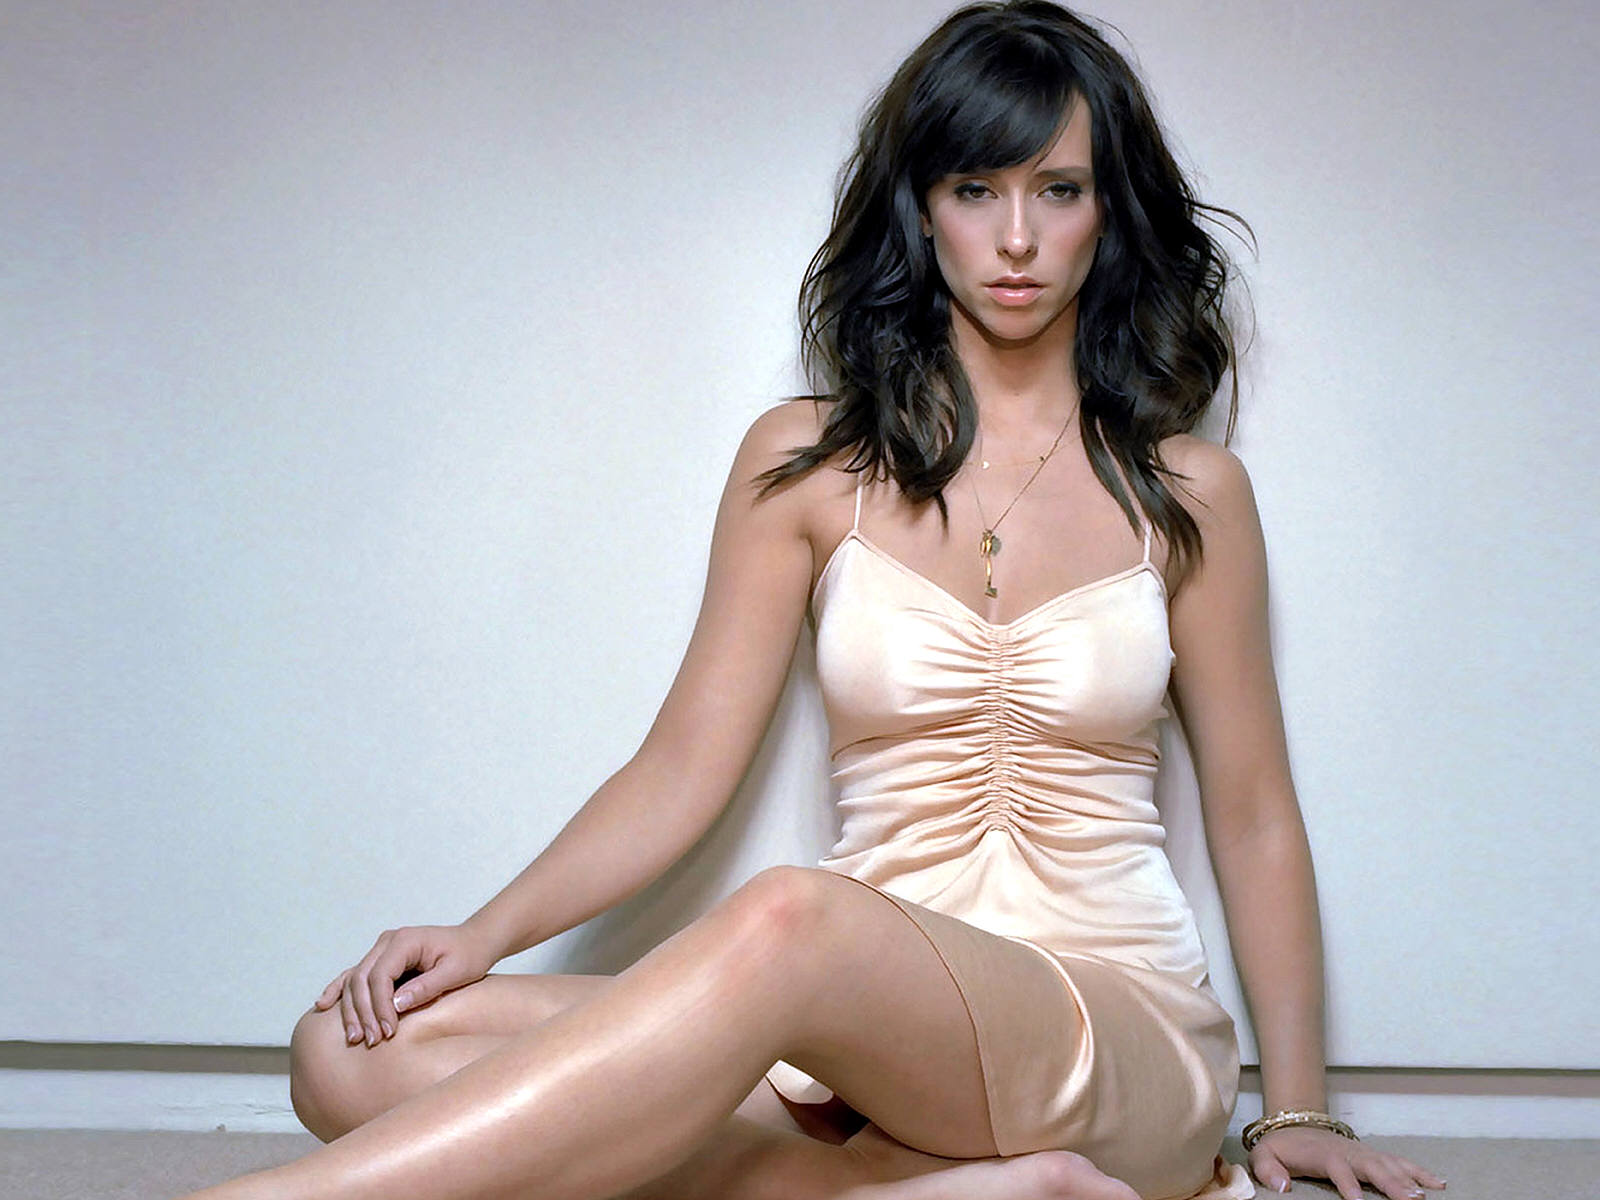 Has Jennifer Love Hewitt ever been nude? -